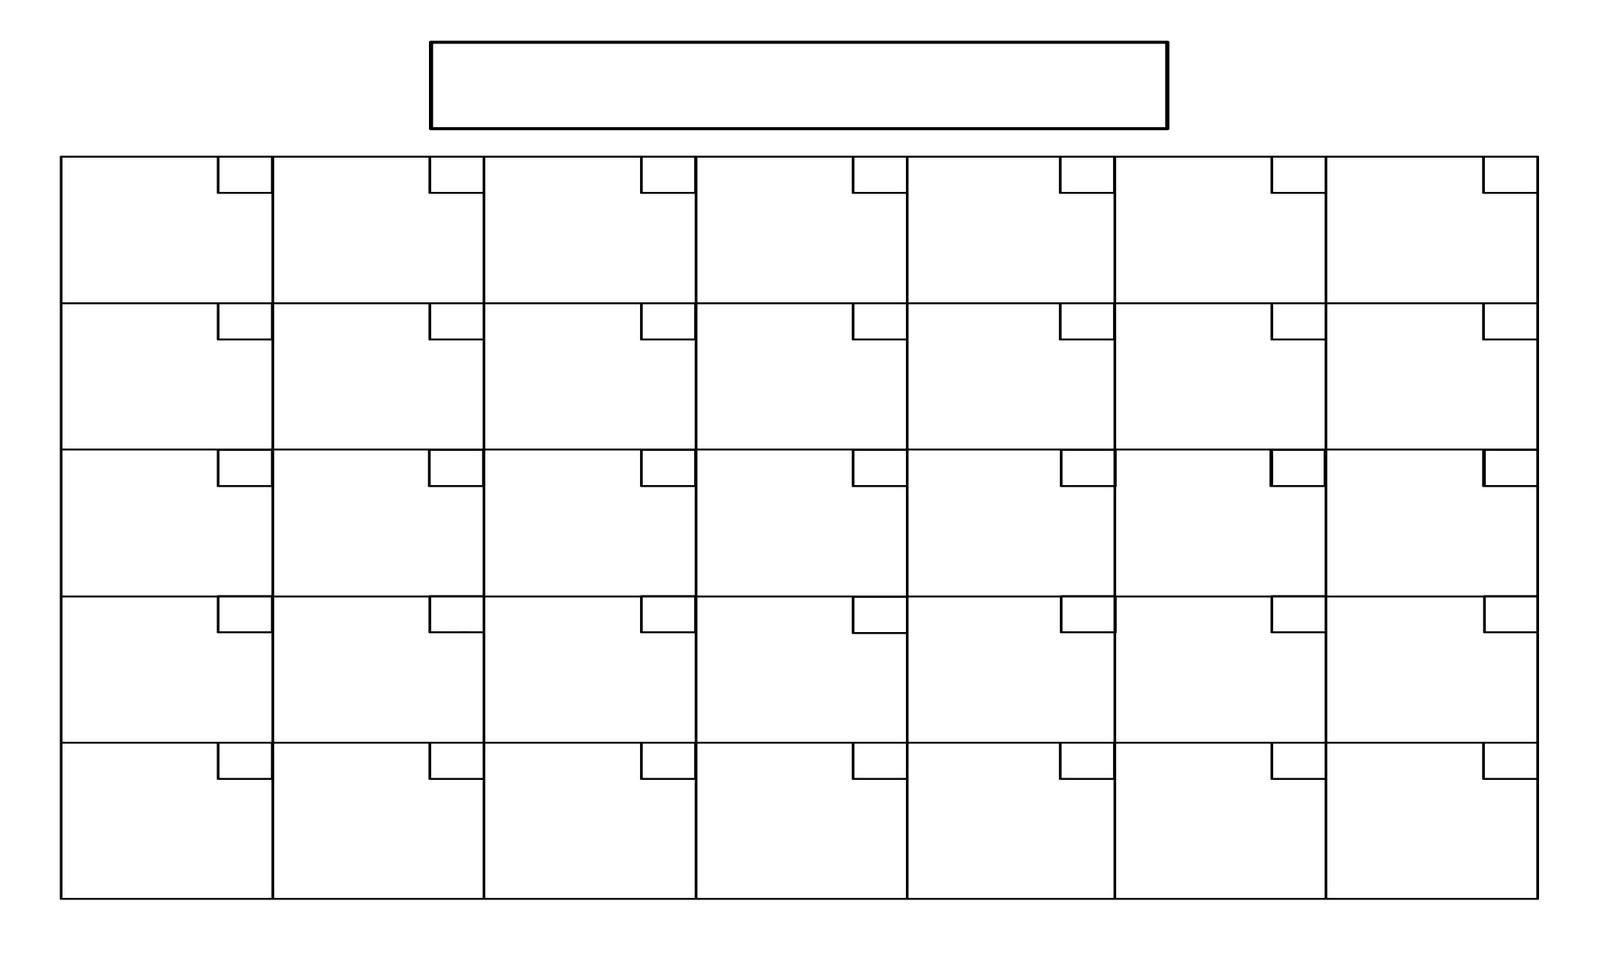 Printable Blank 31 Day Calendar | Template Calendar Printable pertaining to Printable Blank 31 Day Calendar